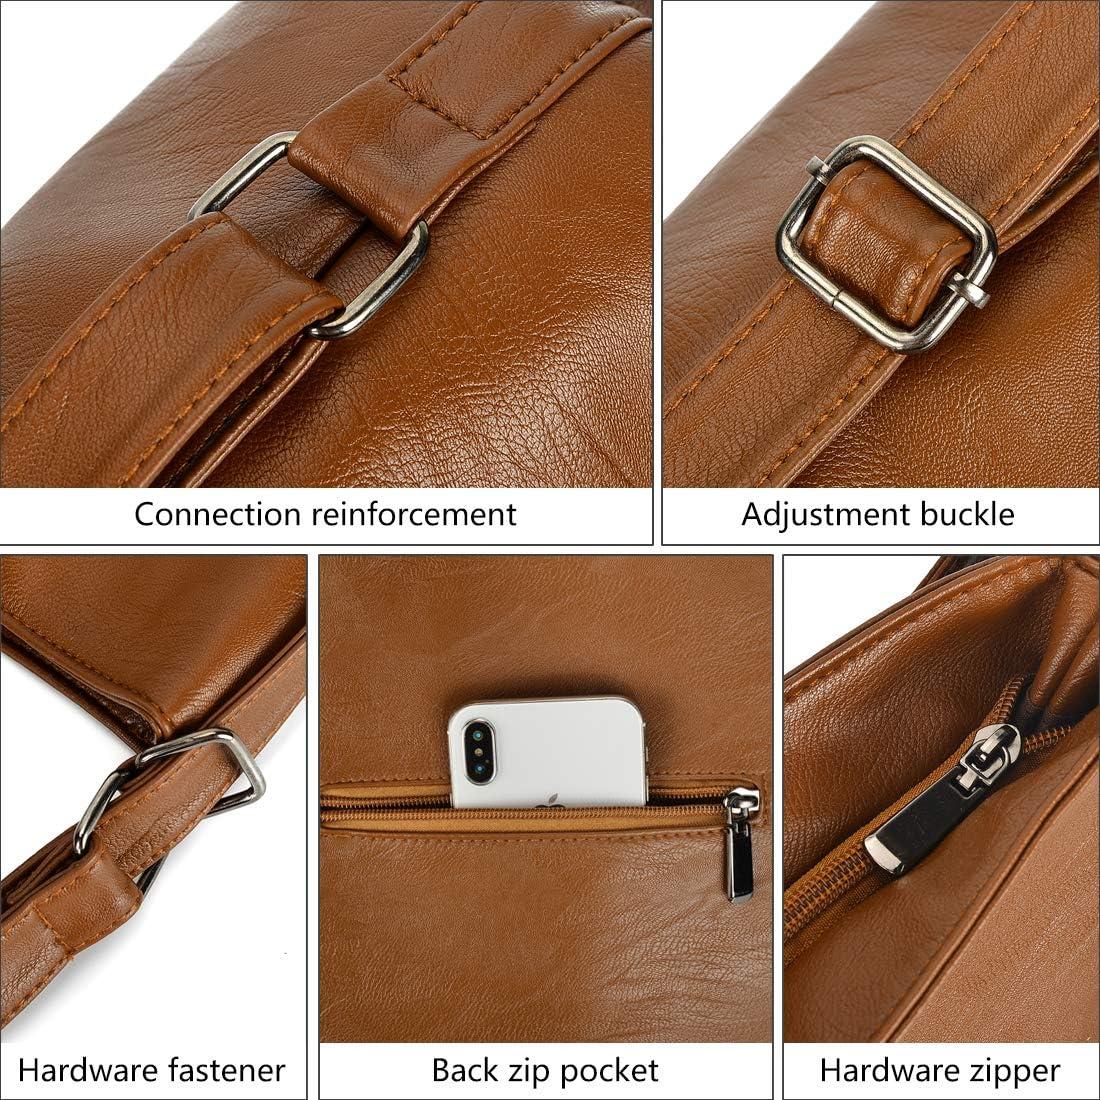 Artwell Women Shoulder Bag Convertible Backpack Purse PU Leather Hobo Style Handbag Totes Bronze2